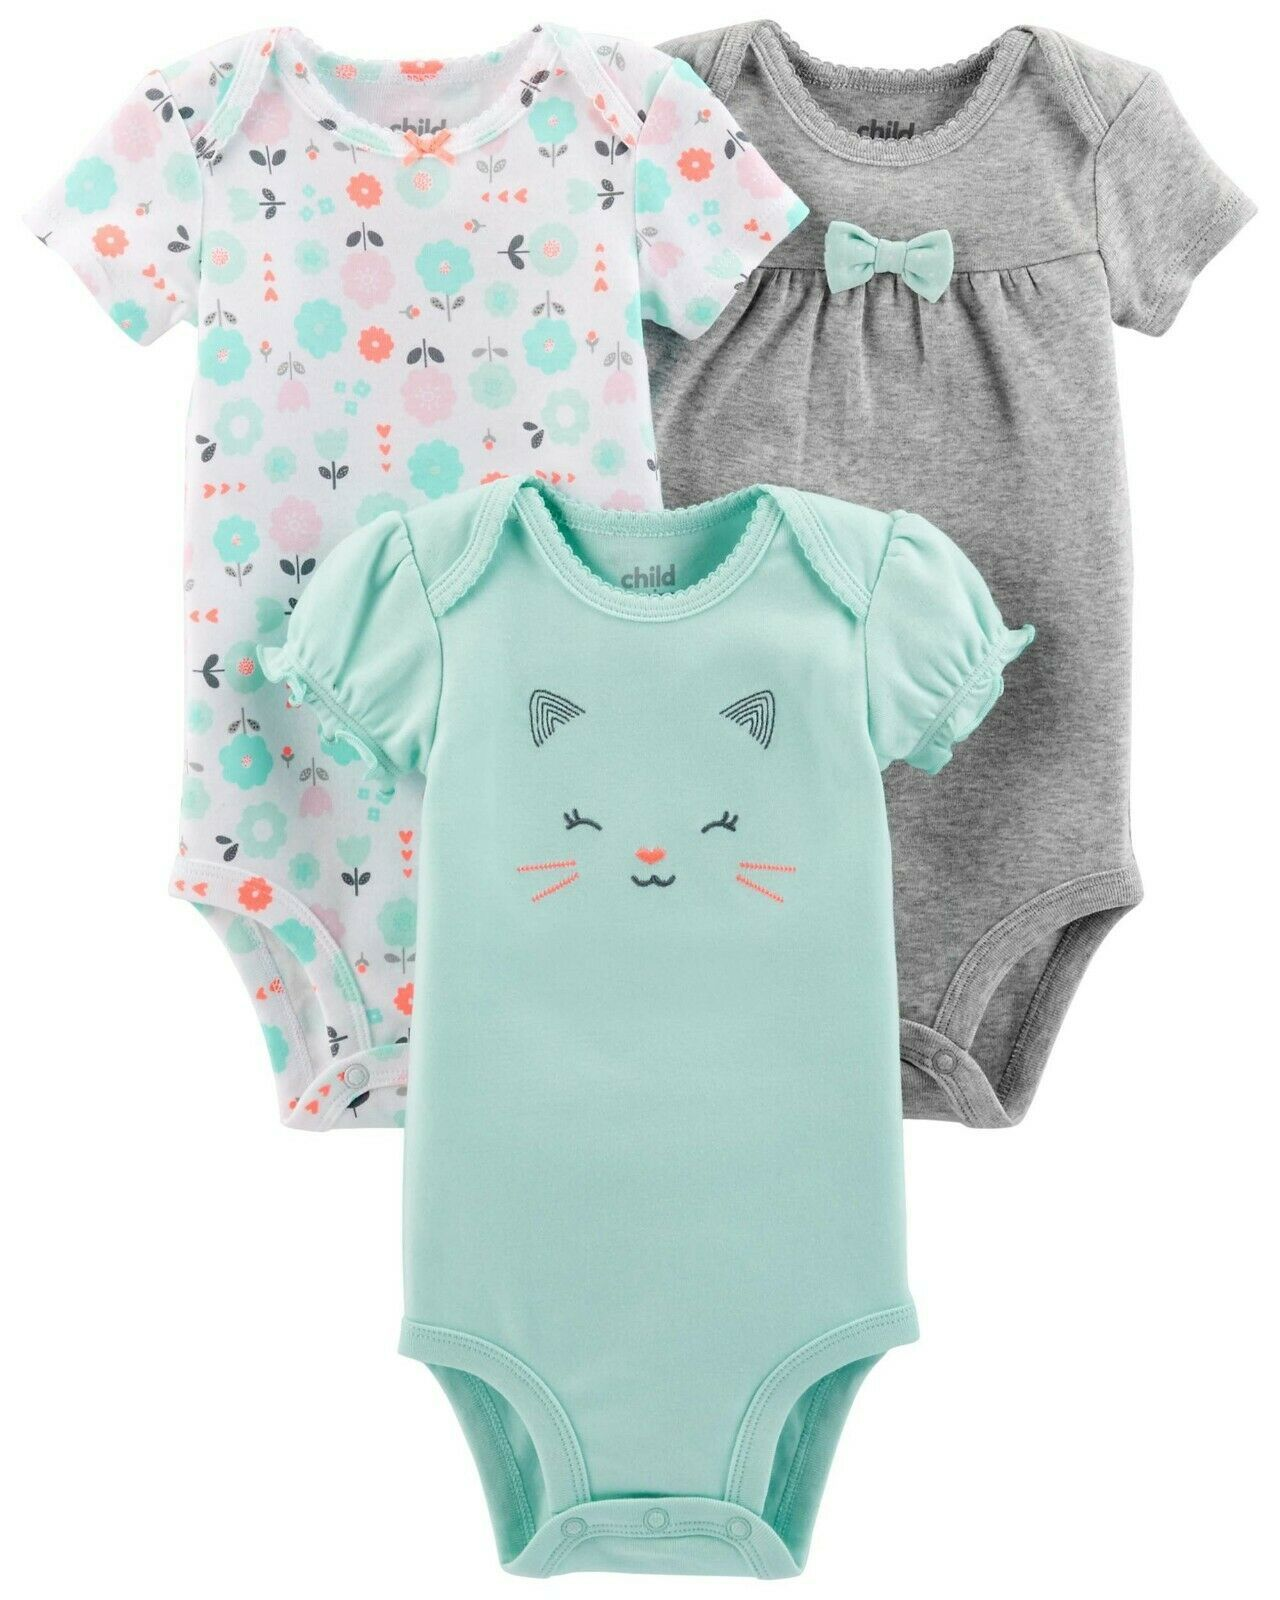 Carters Girls Premature 5 Pack Bodysuits Preemie Gold Love Reborn Dolls